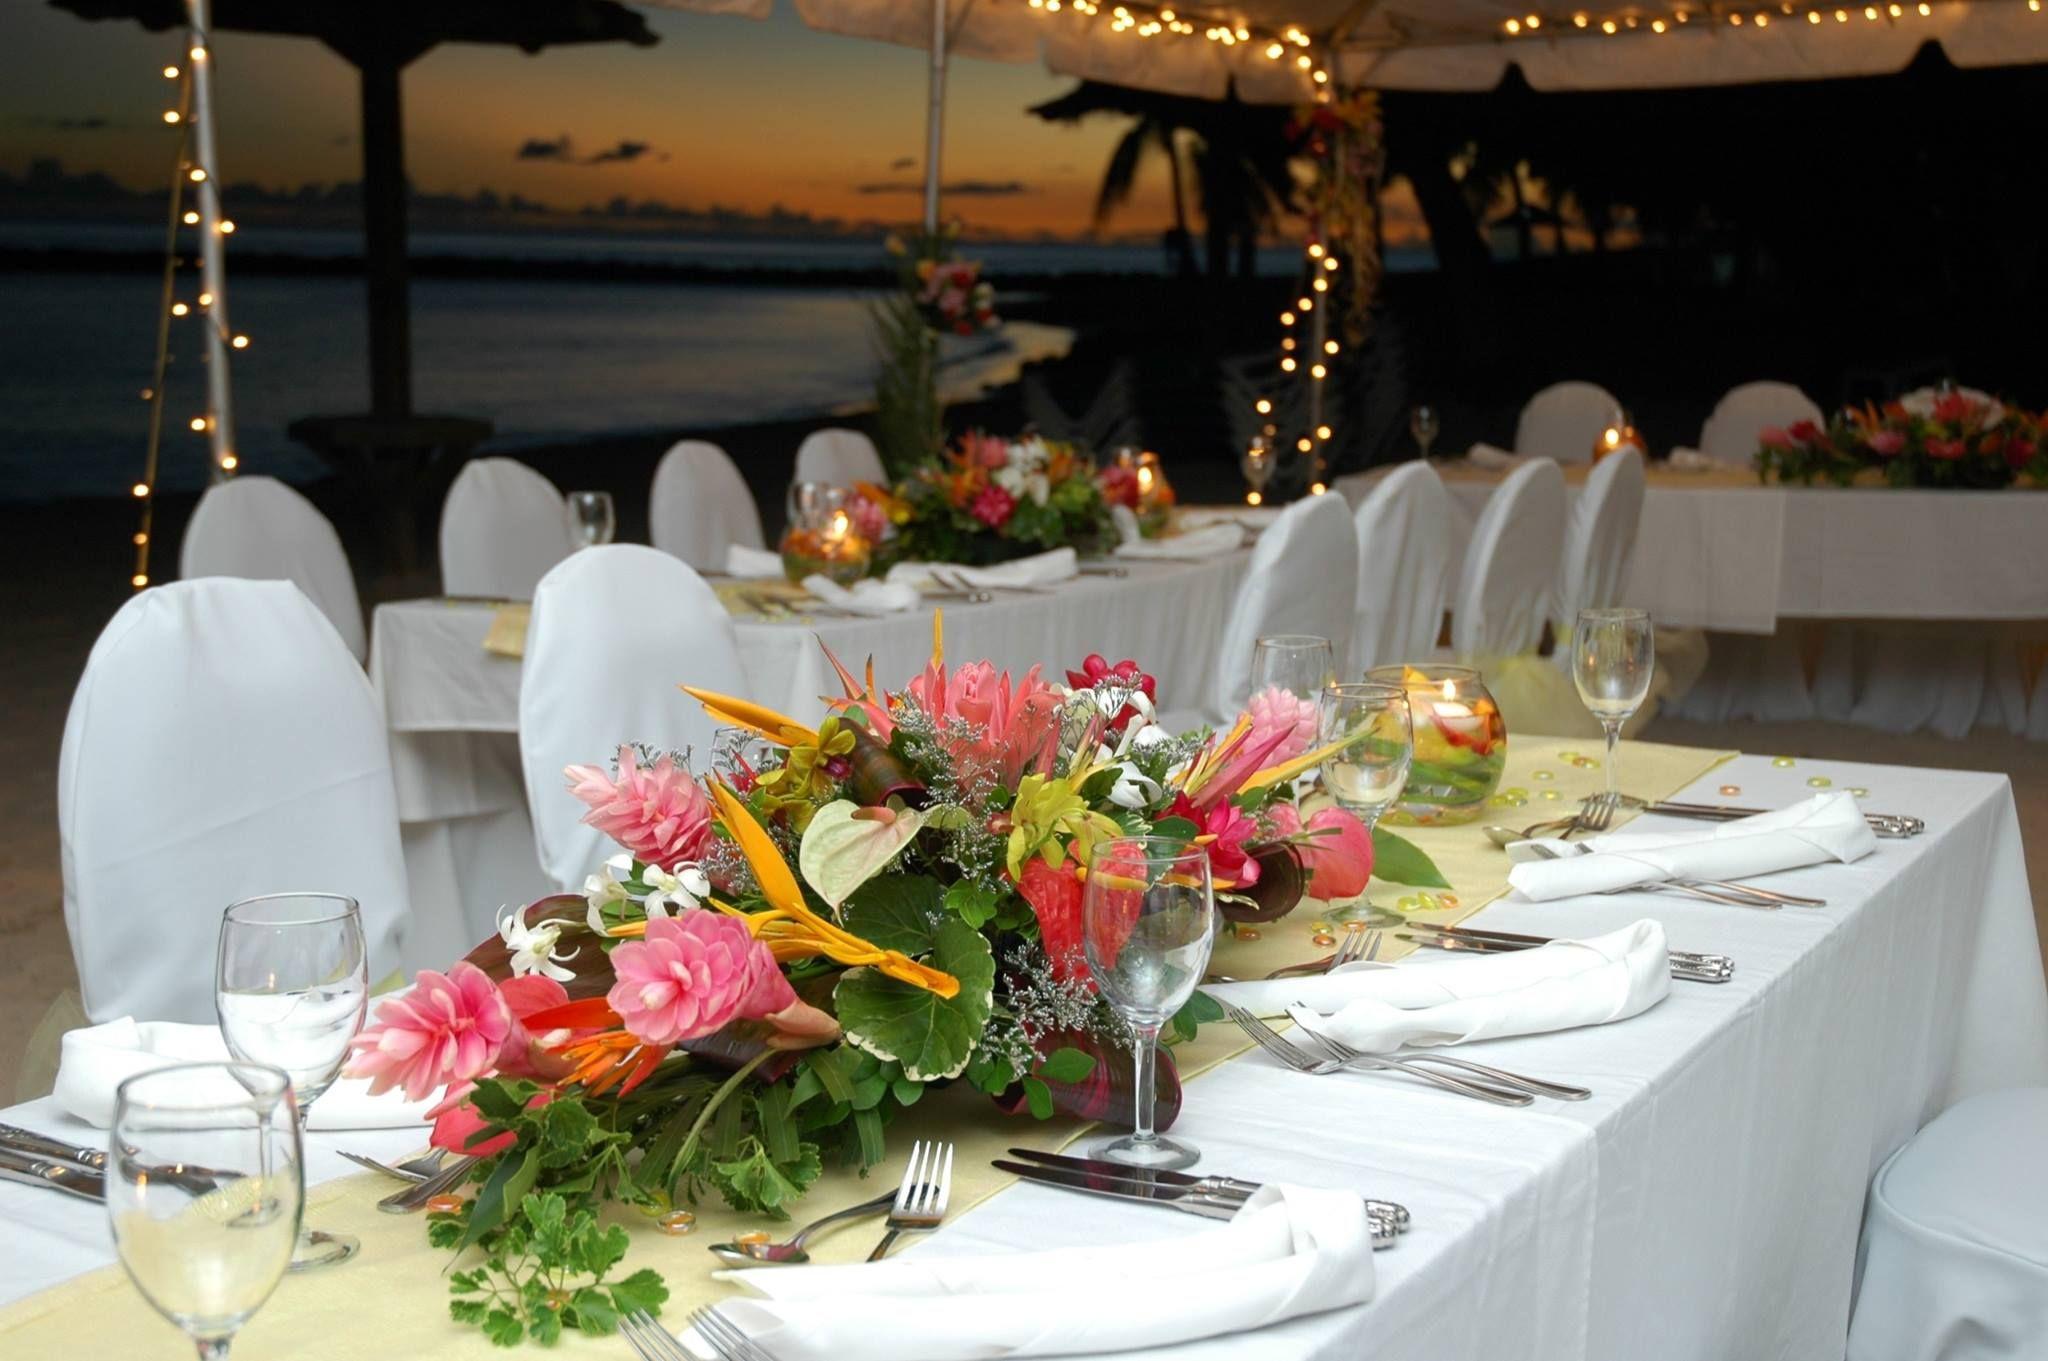 Sunset Beach Reception Venue Beach wedding reception